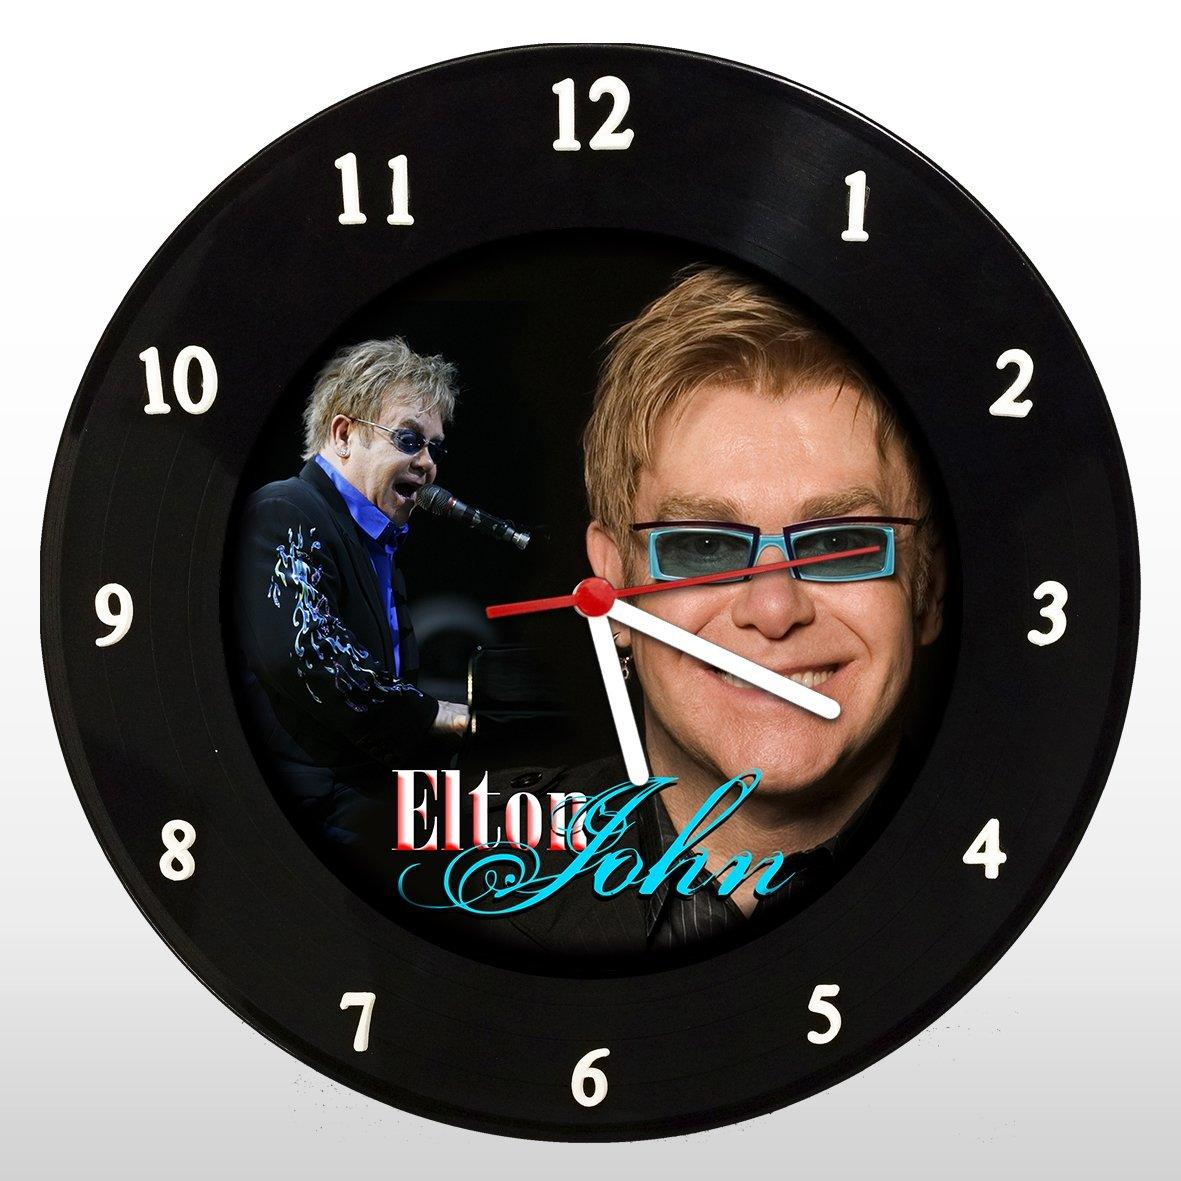 Elton John - Relógio de Parede em Disco de Vinil - Mr. Rock